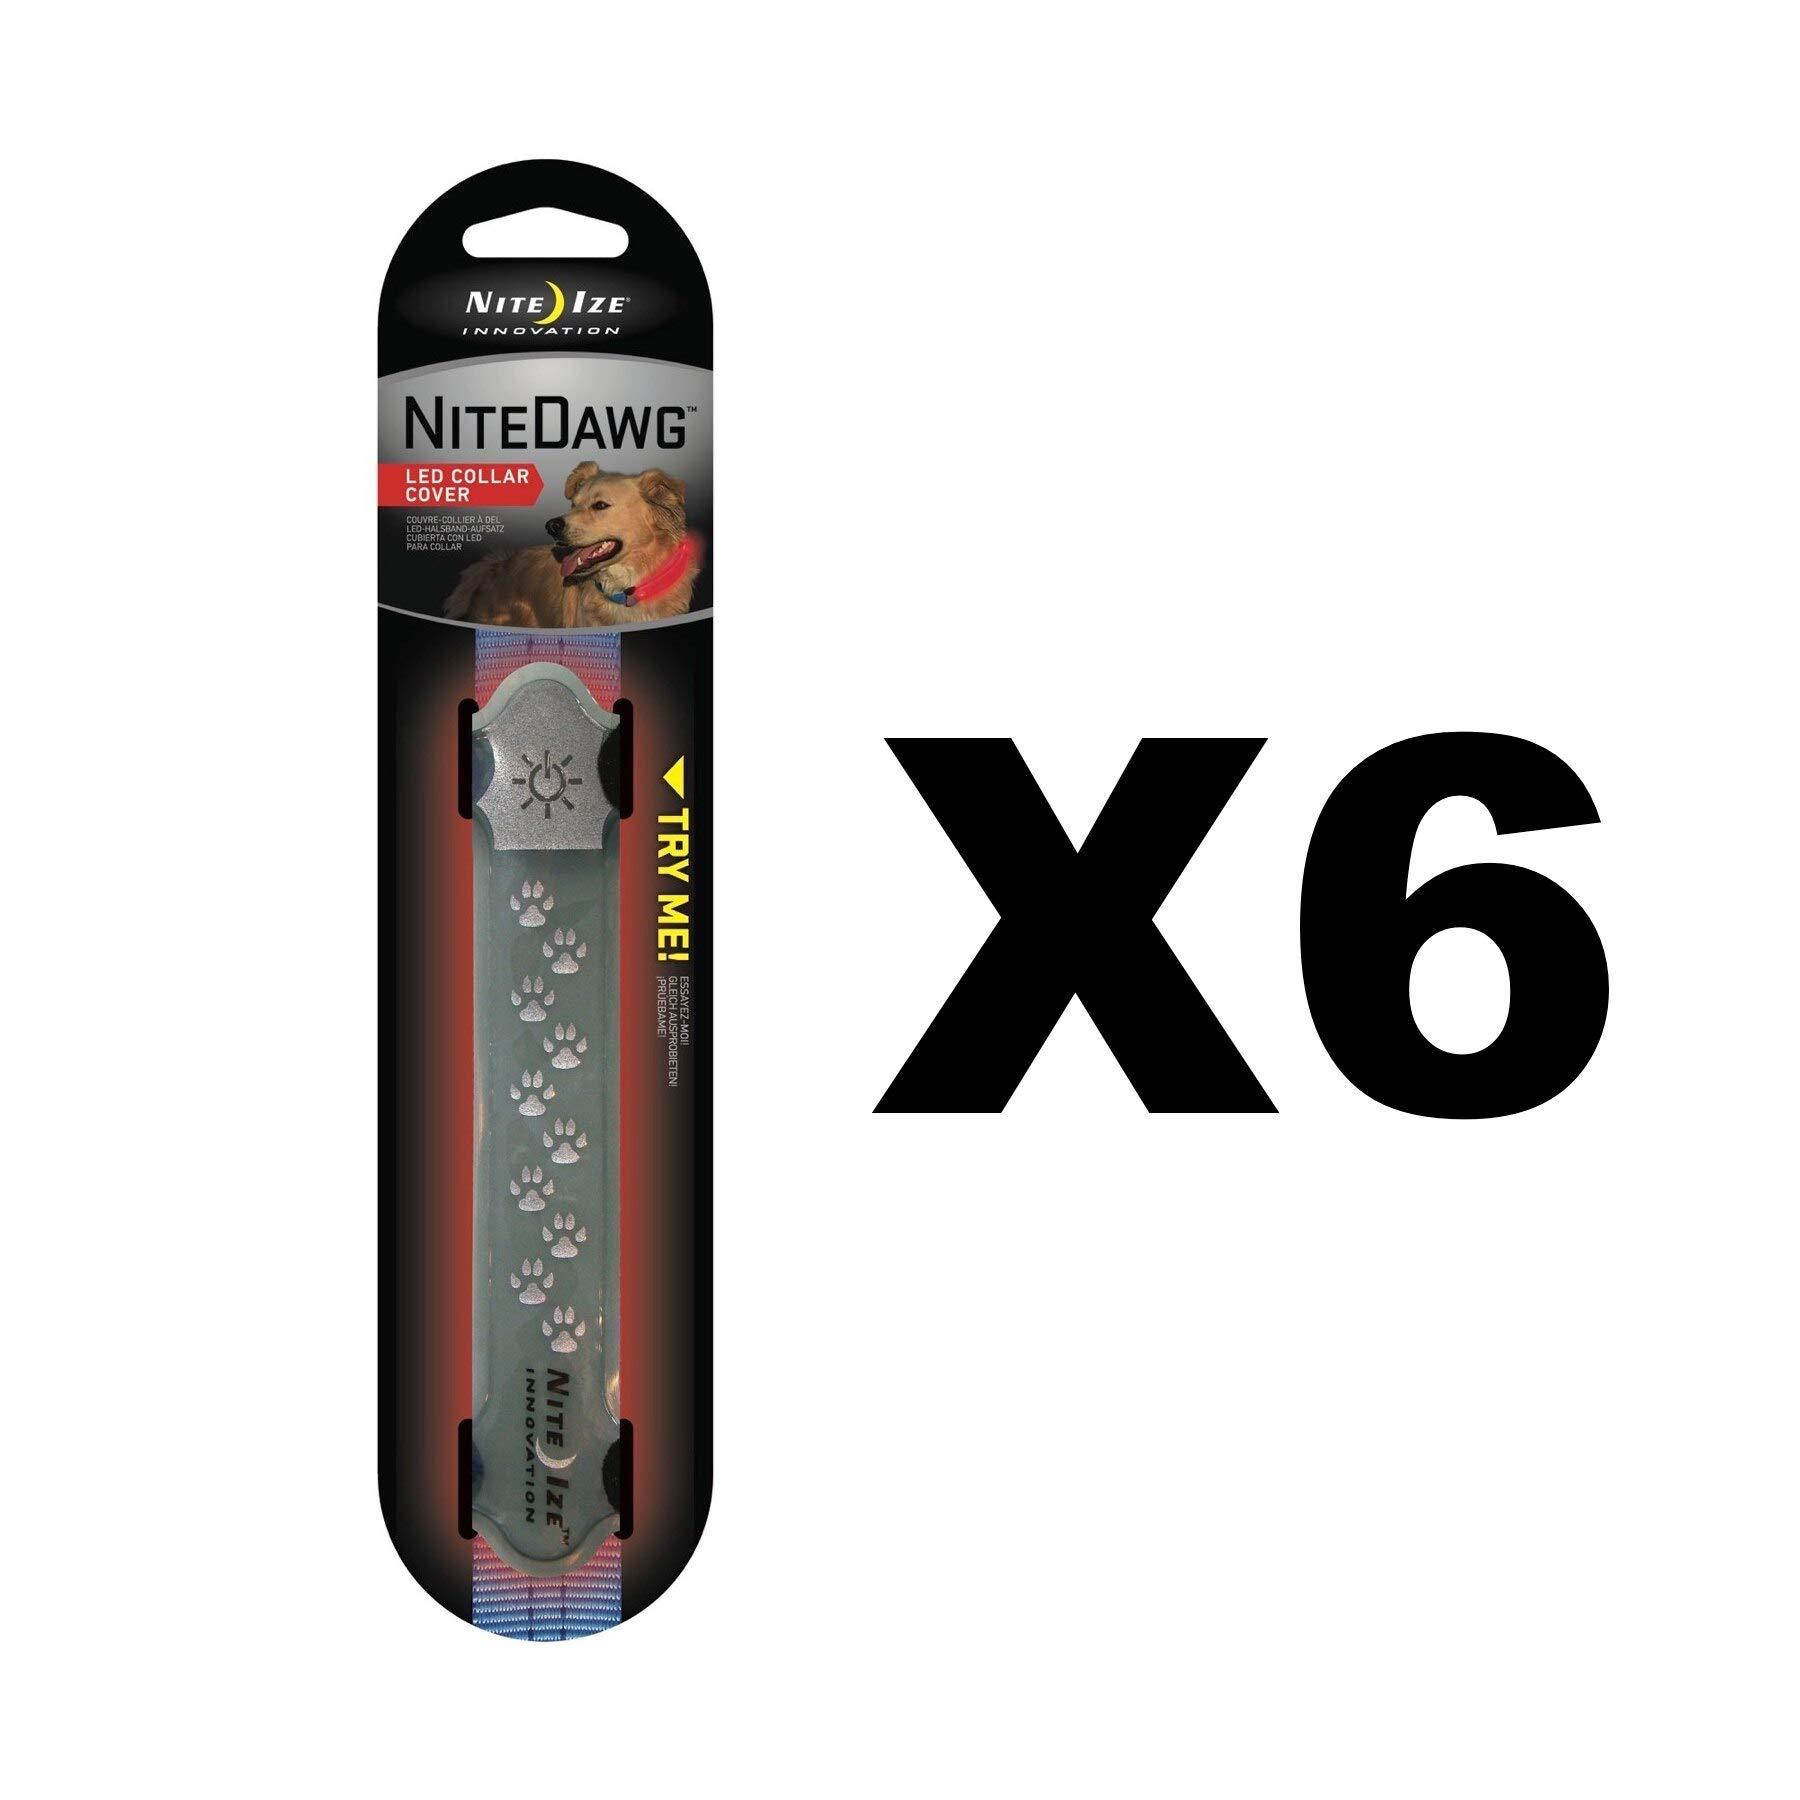 Nite Ize Inc 6 Packs GRY LED Collar Cover by Nite Ize